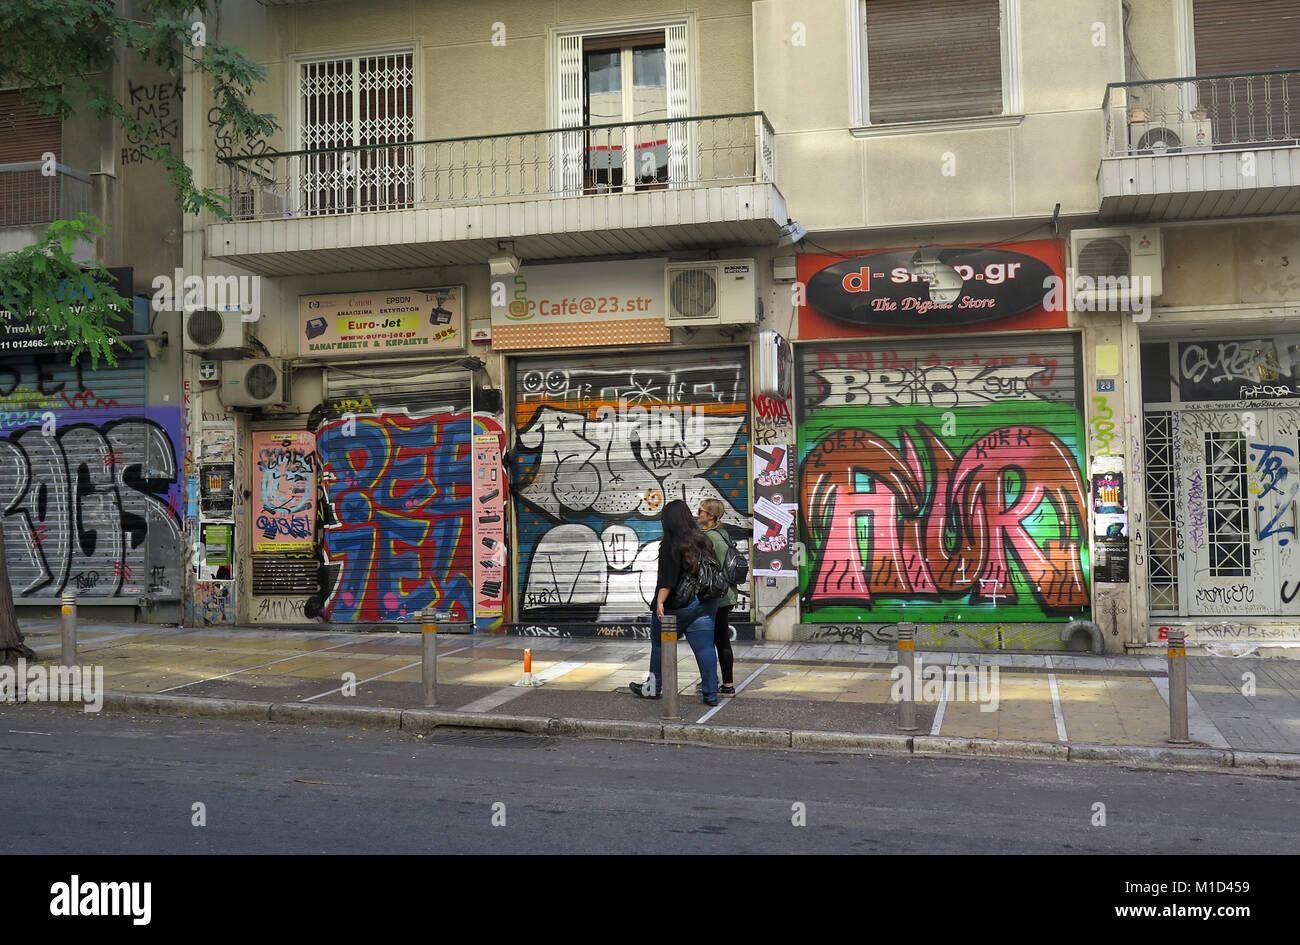 Geschlossene Laeden, Bezirk Exarchia, Athen, Griechenland Stock Photo